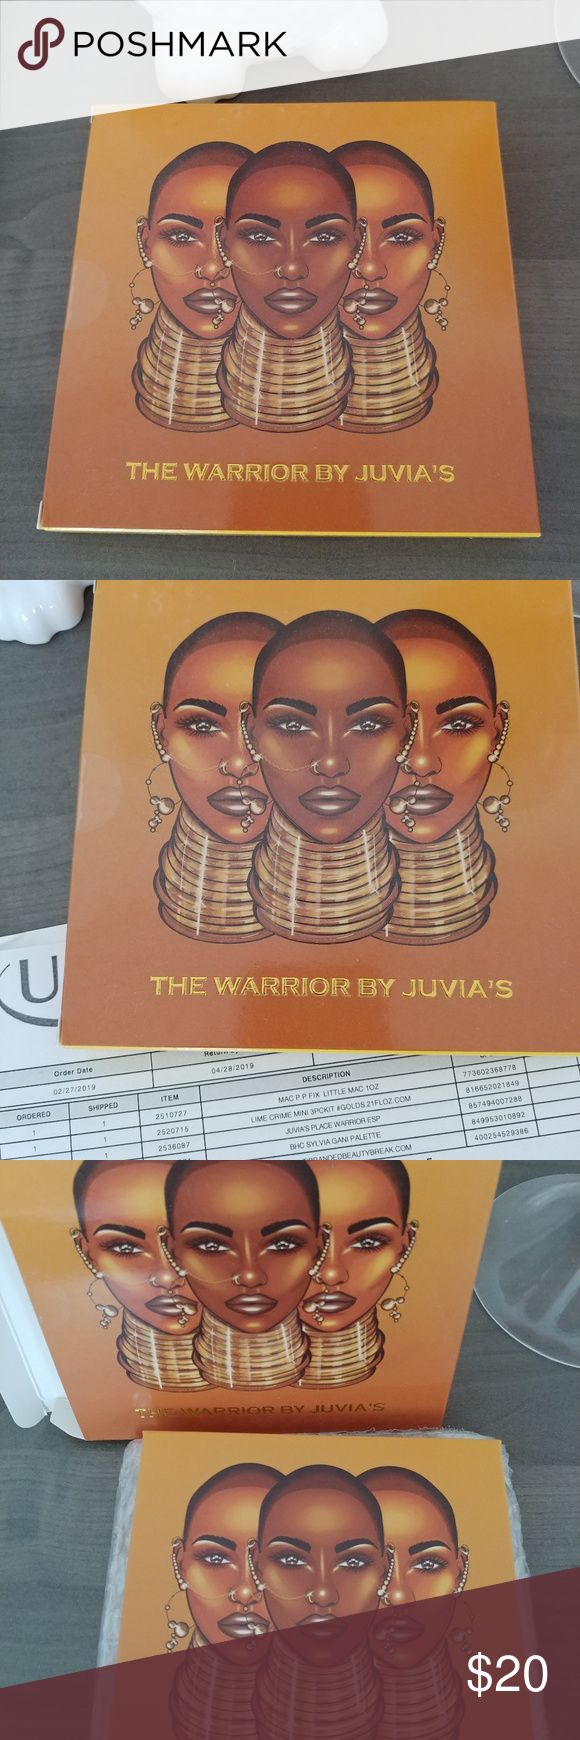 NWT The Warrior von Juvia's Palette NWT The Warrior von Juvia's Palette B …   – My Posh Picks